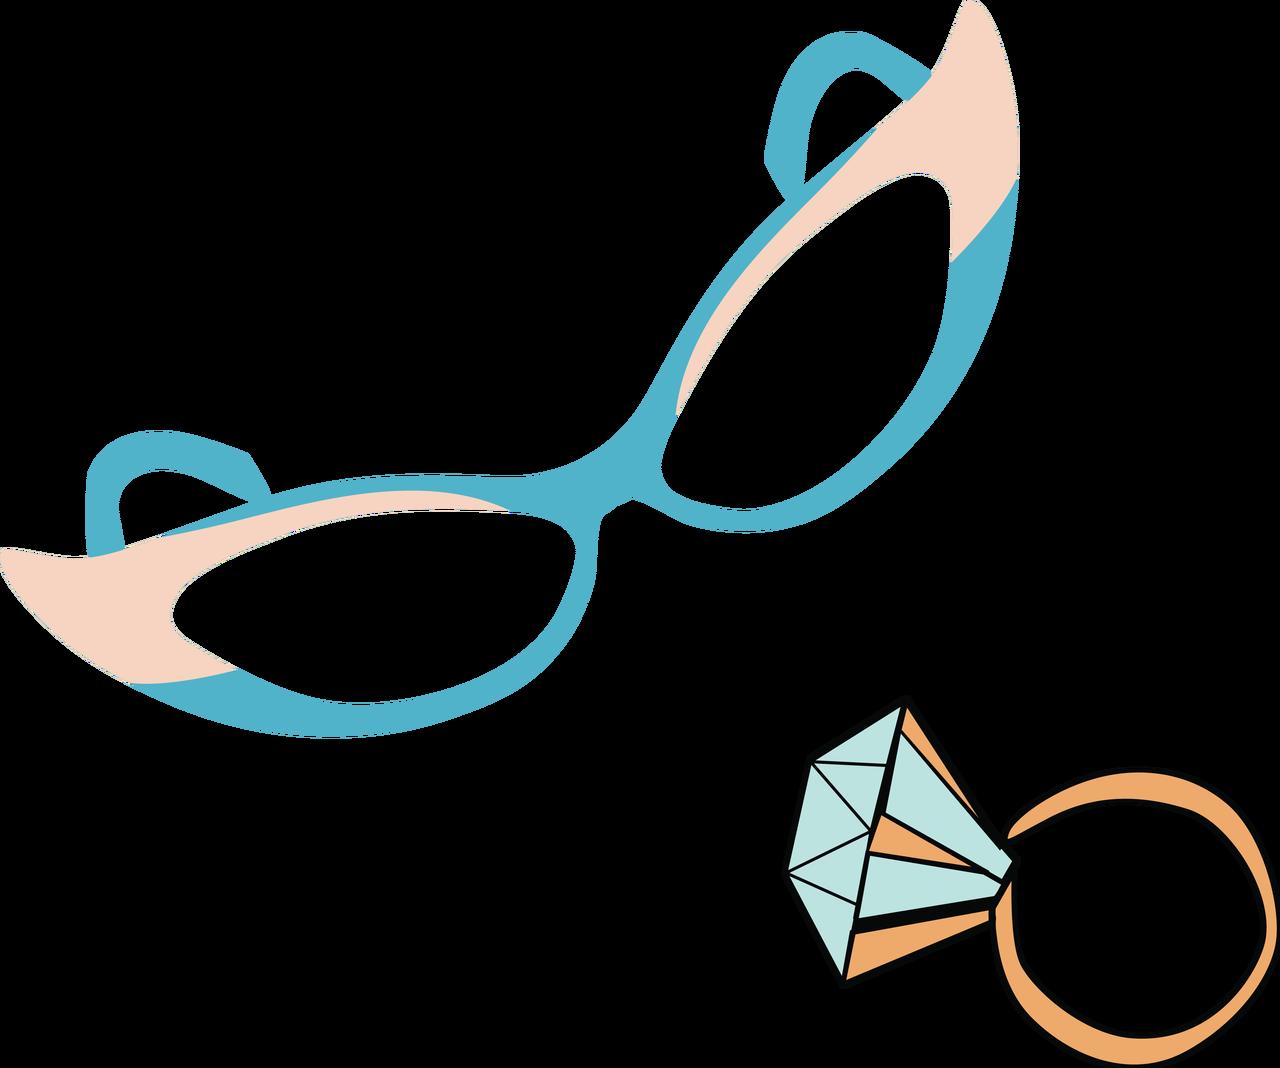 Sunglasses and Diamond Ring SVG Cut File